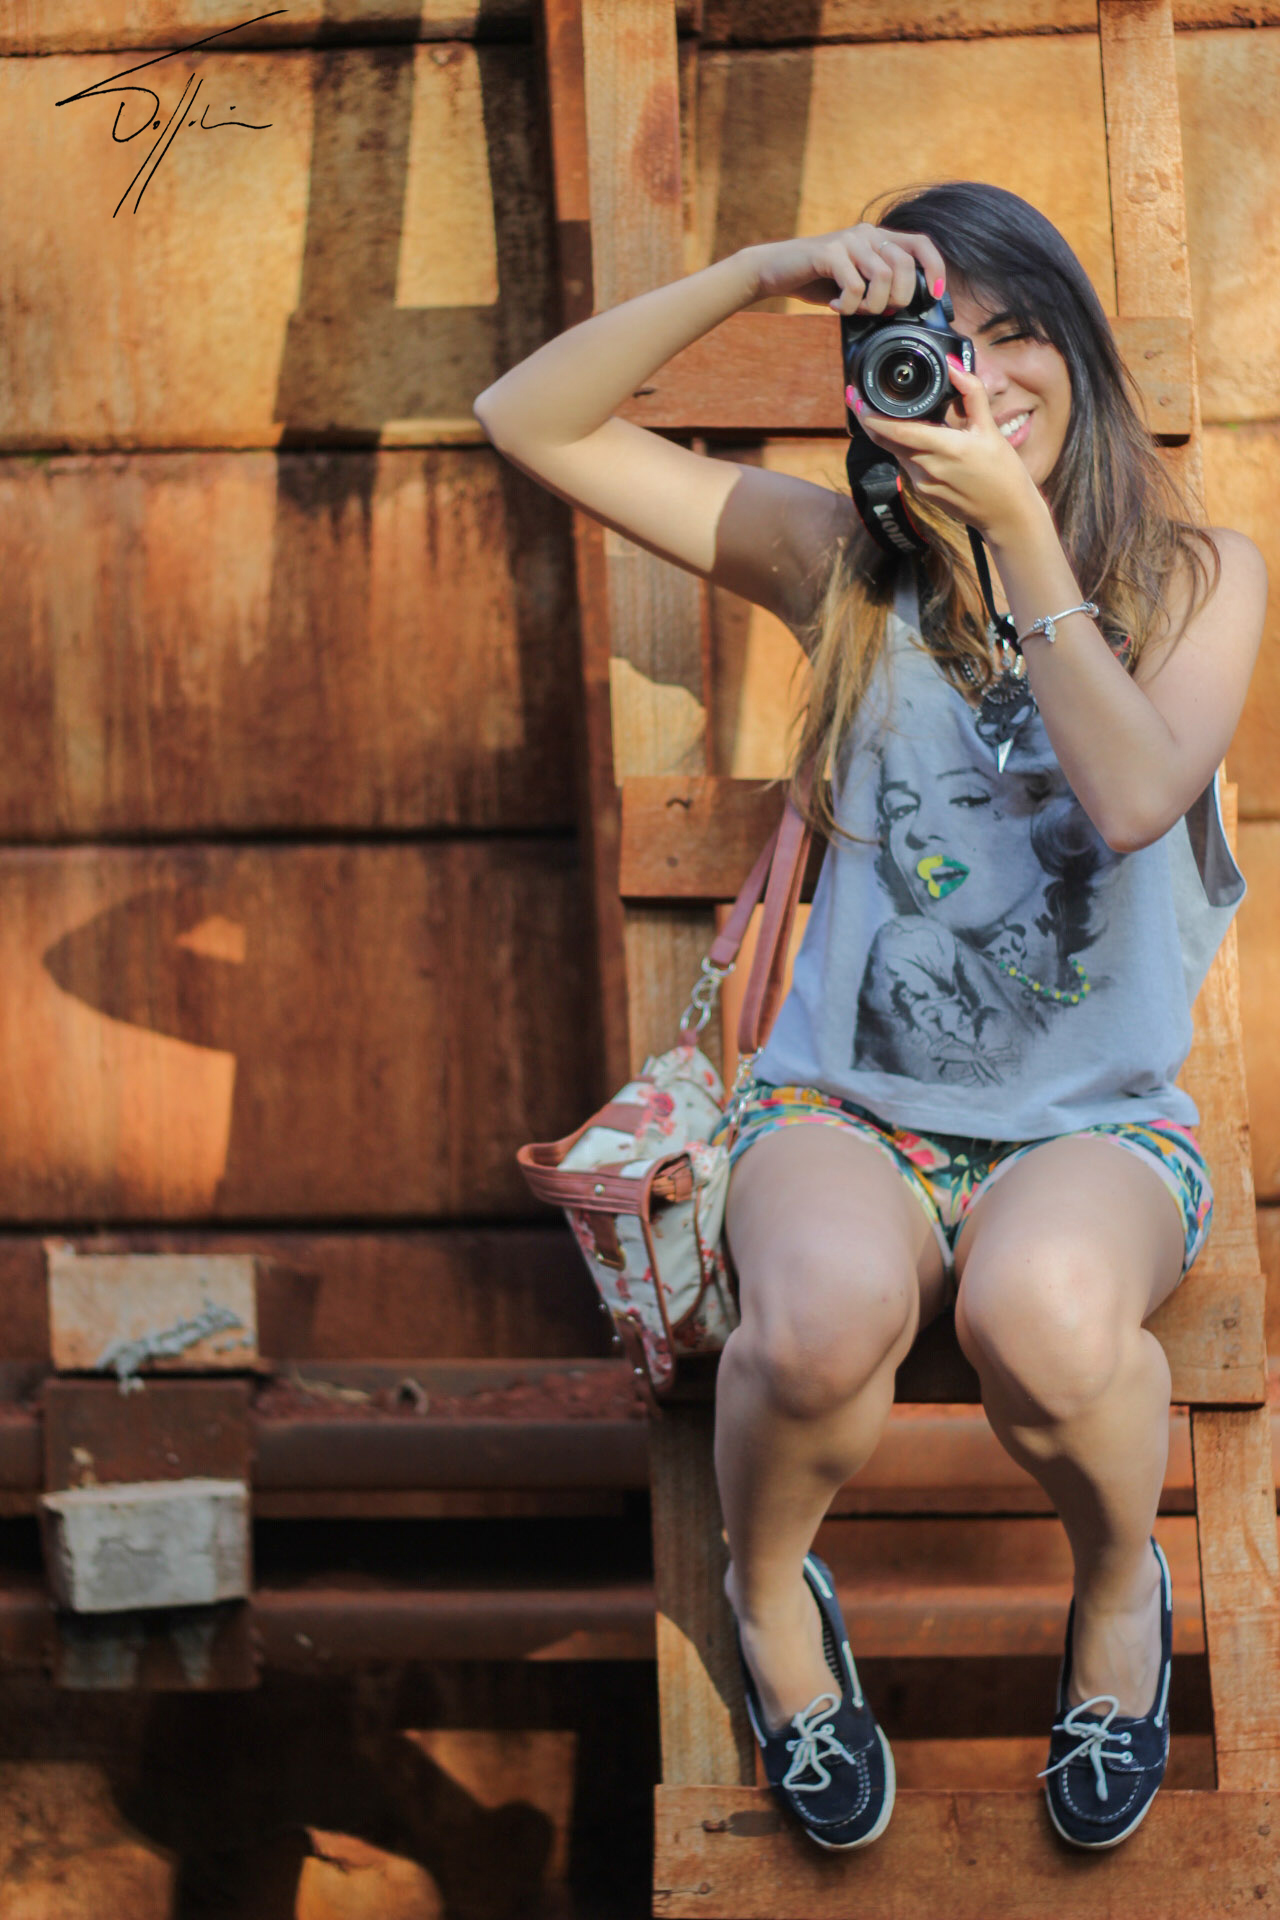 Contate Isadora Dantas - Fotógrafa - Infantil - Maringá - Família - Casamento